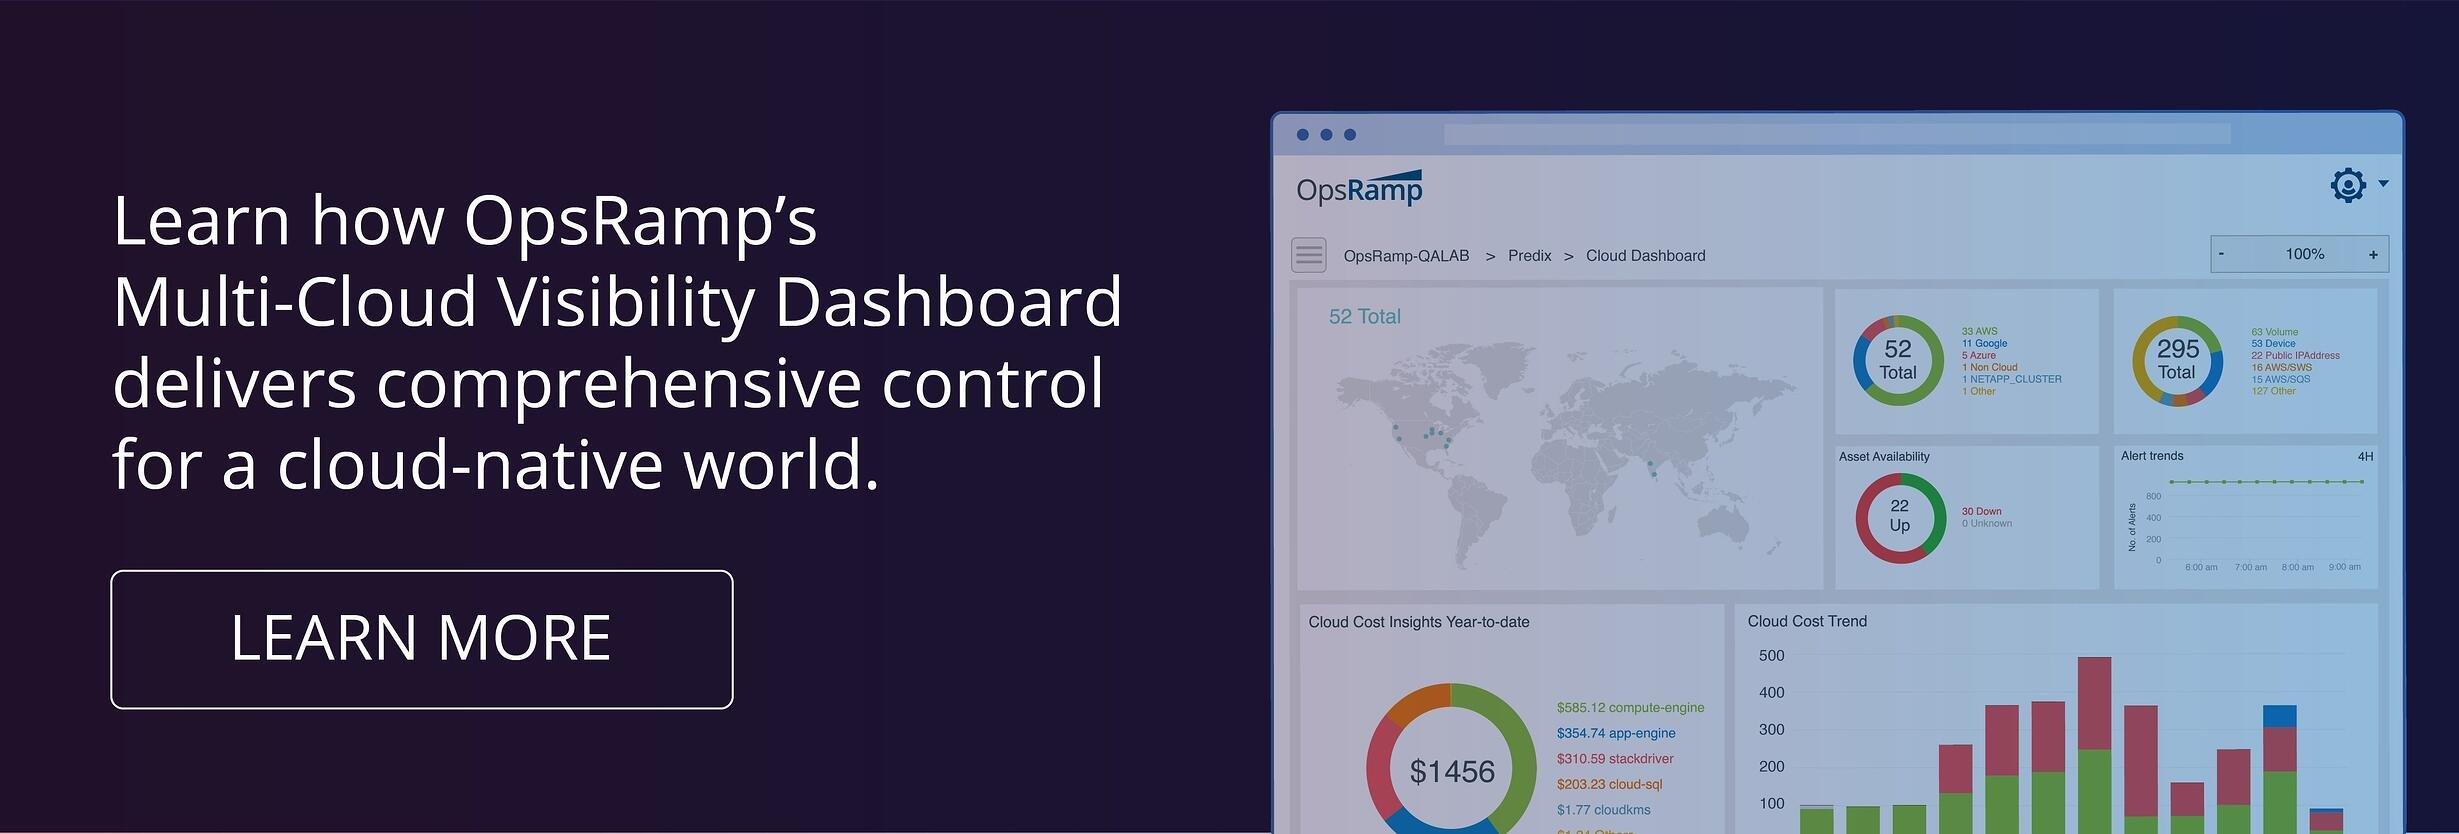 Multi-Cloud Visibility Dashboard